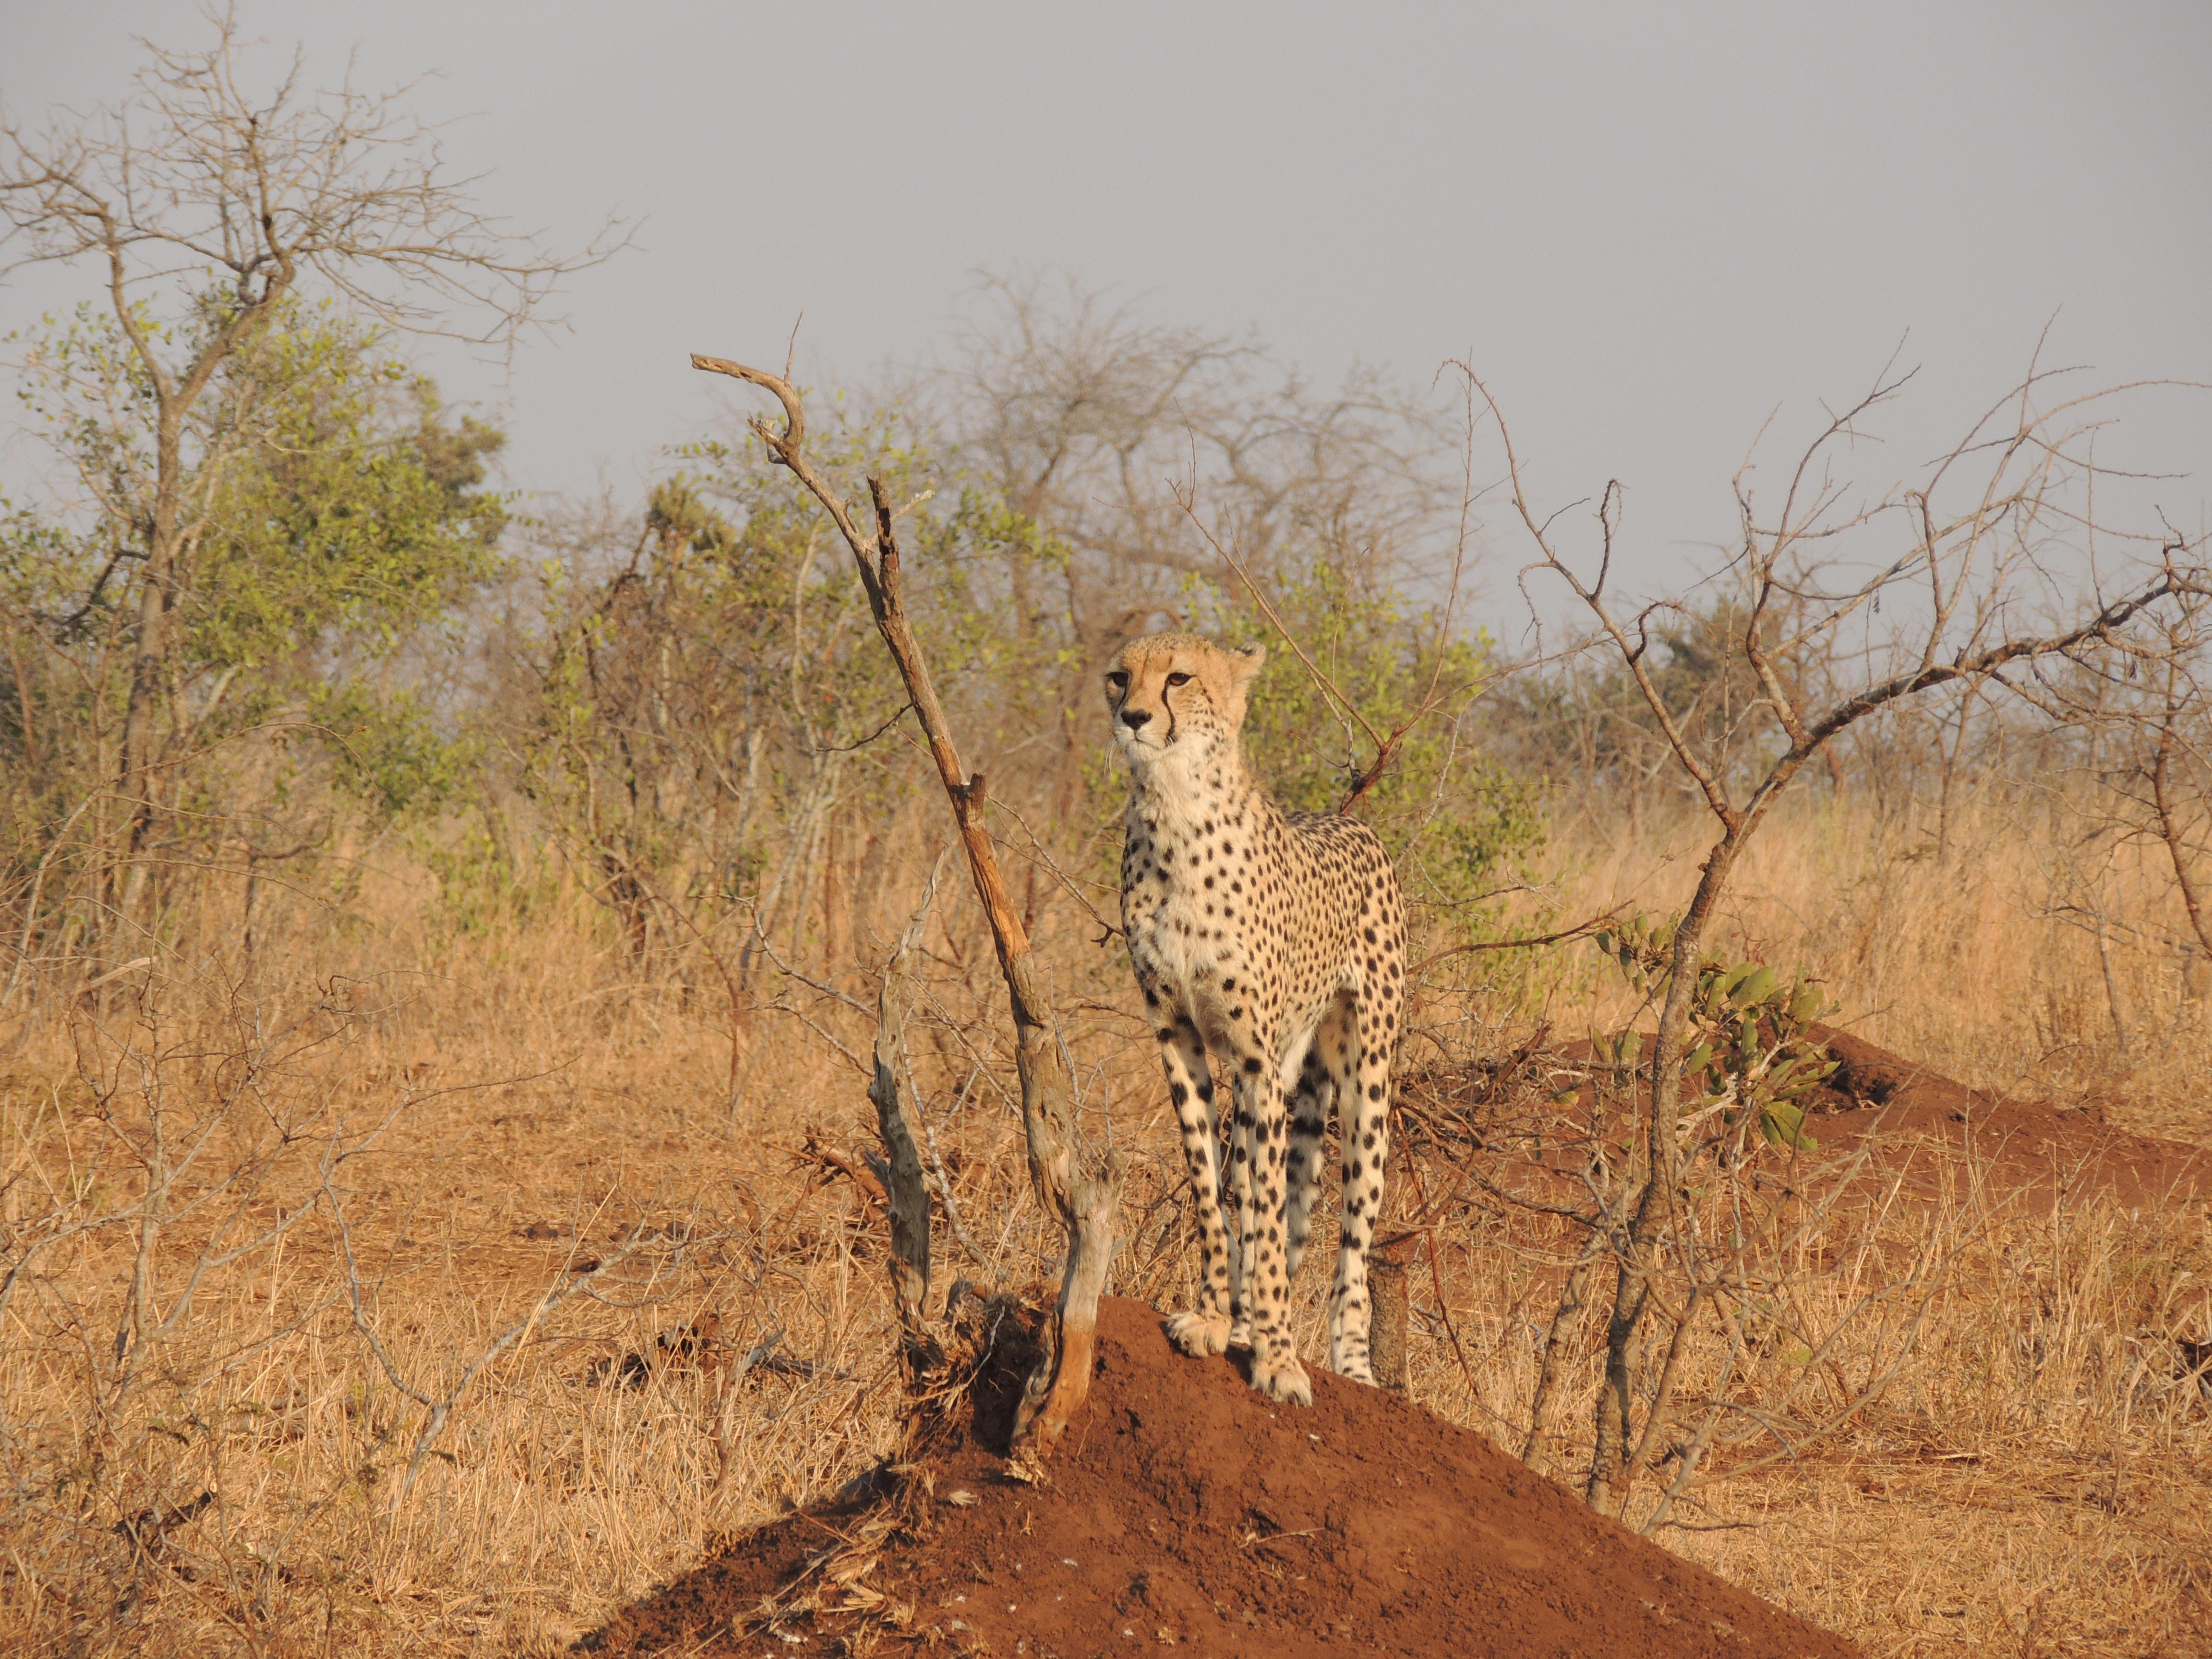 cheetah standing on brown soil